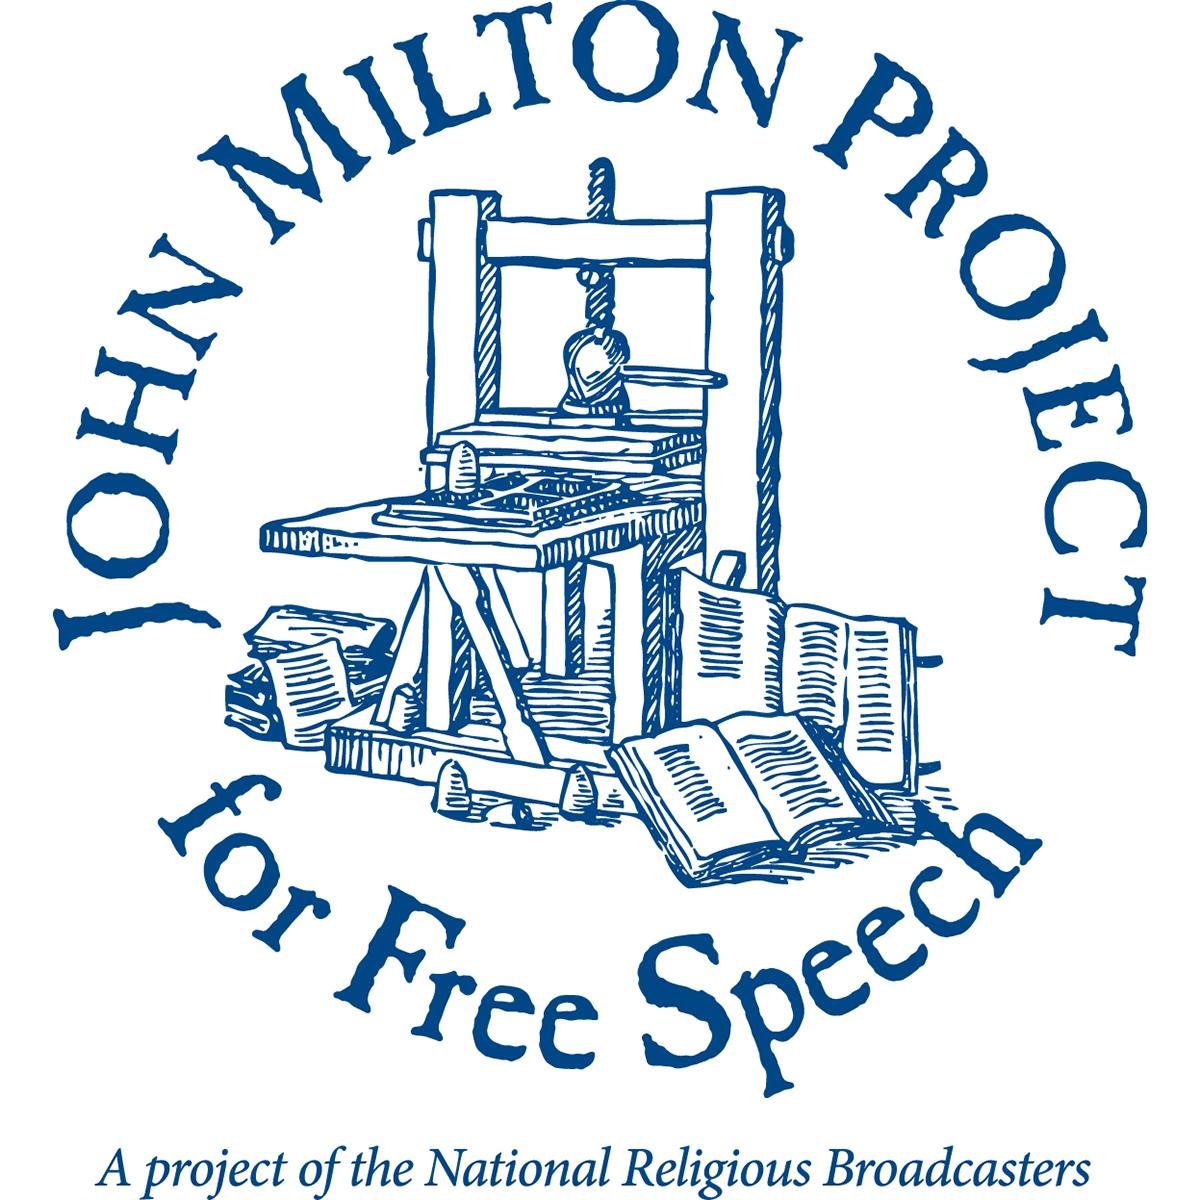 John Milton Project